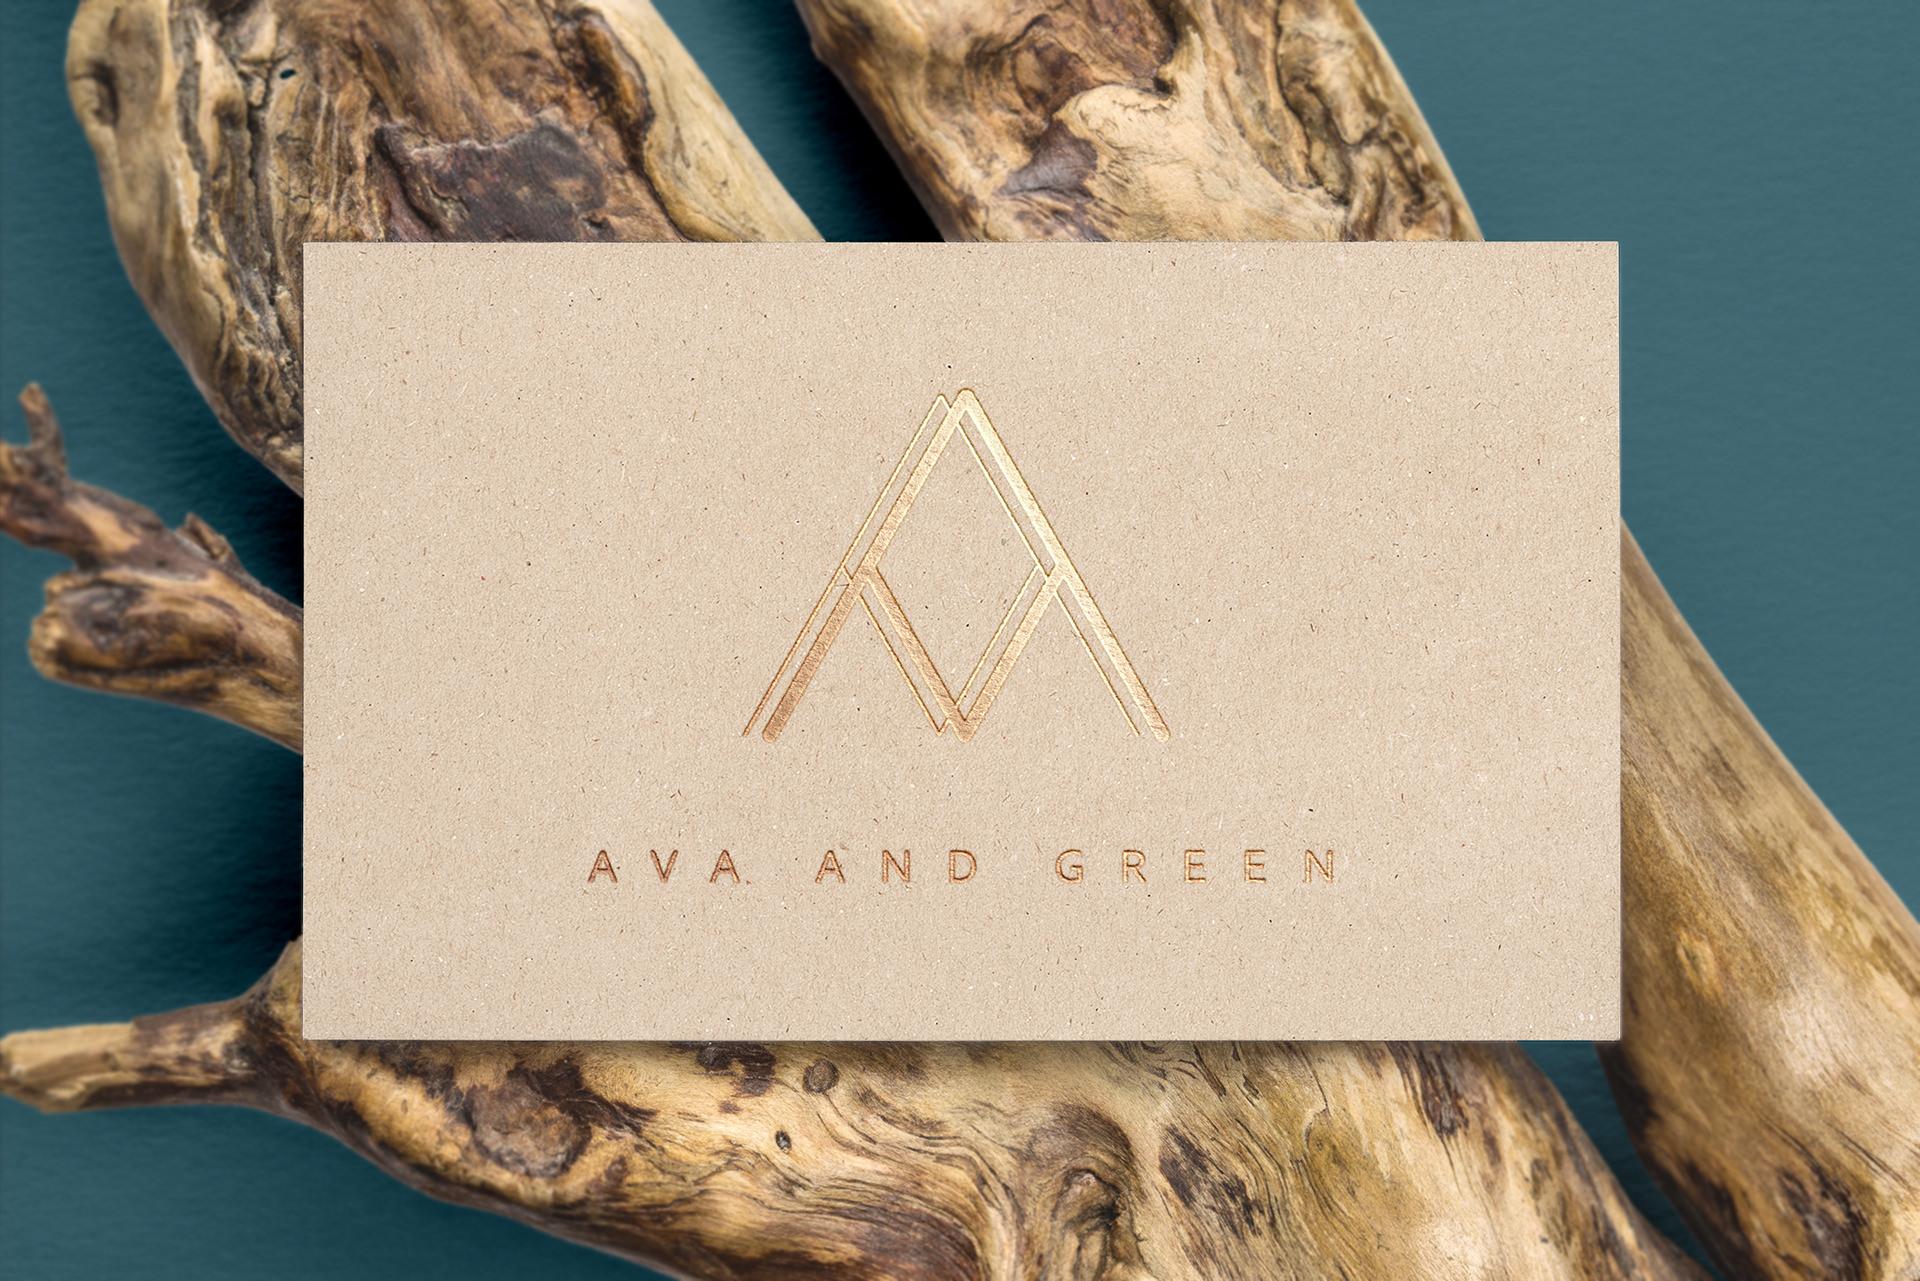 Frey und Meute - Ava and Green - visitenkarte